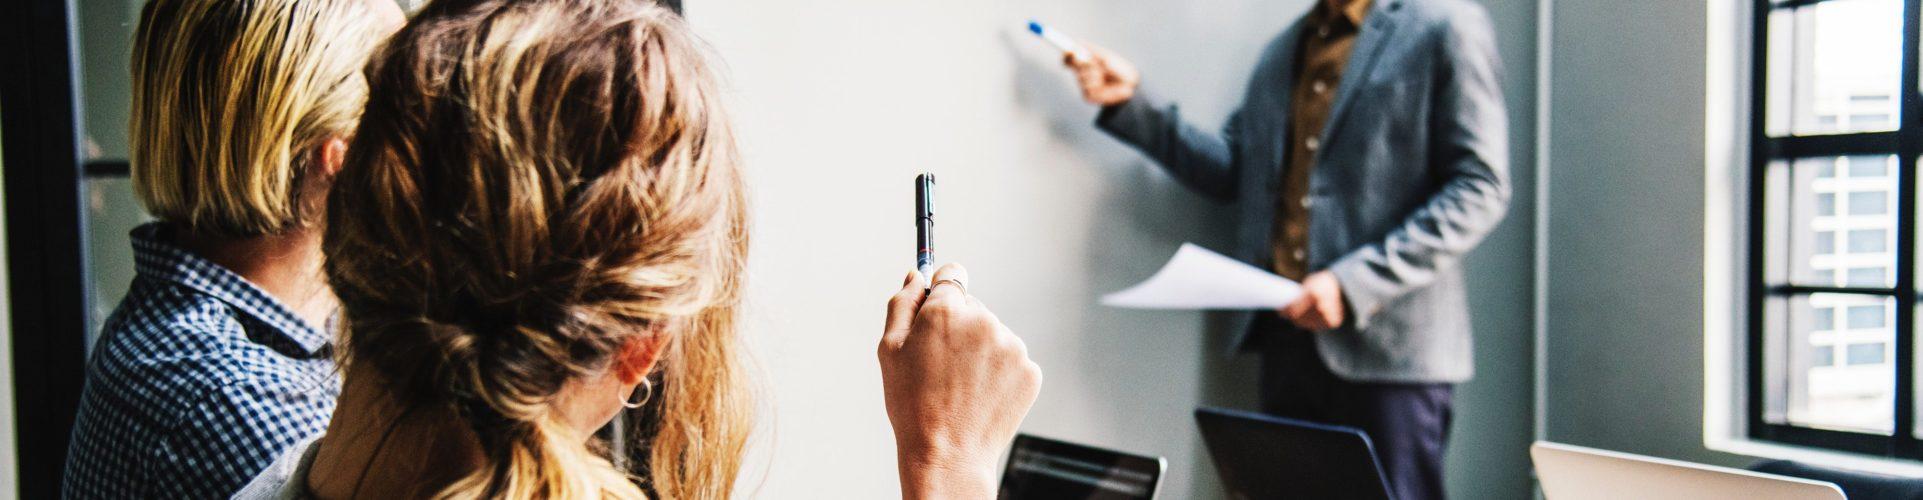 8 Questions to Ask A Prospective Merchant Services Partner